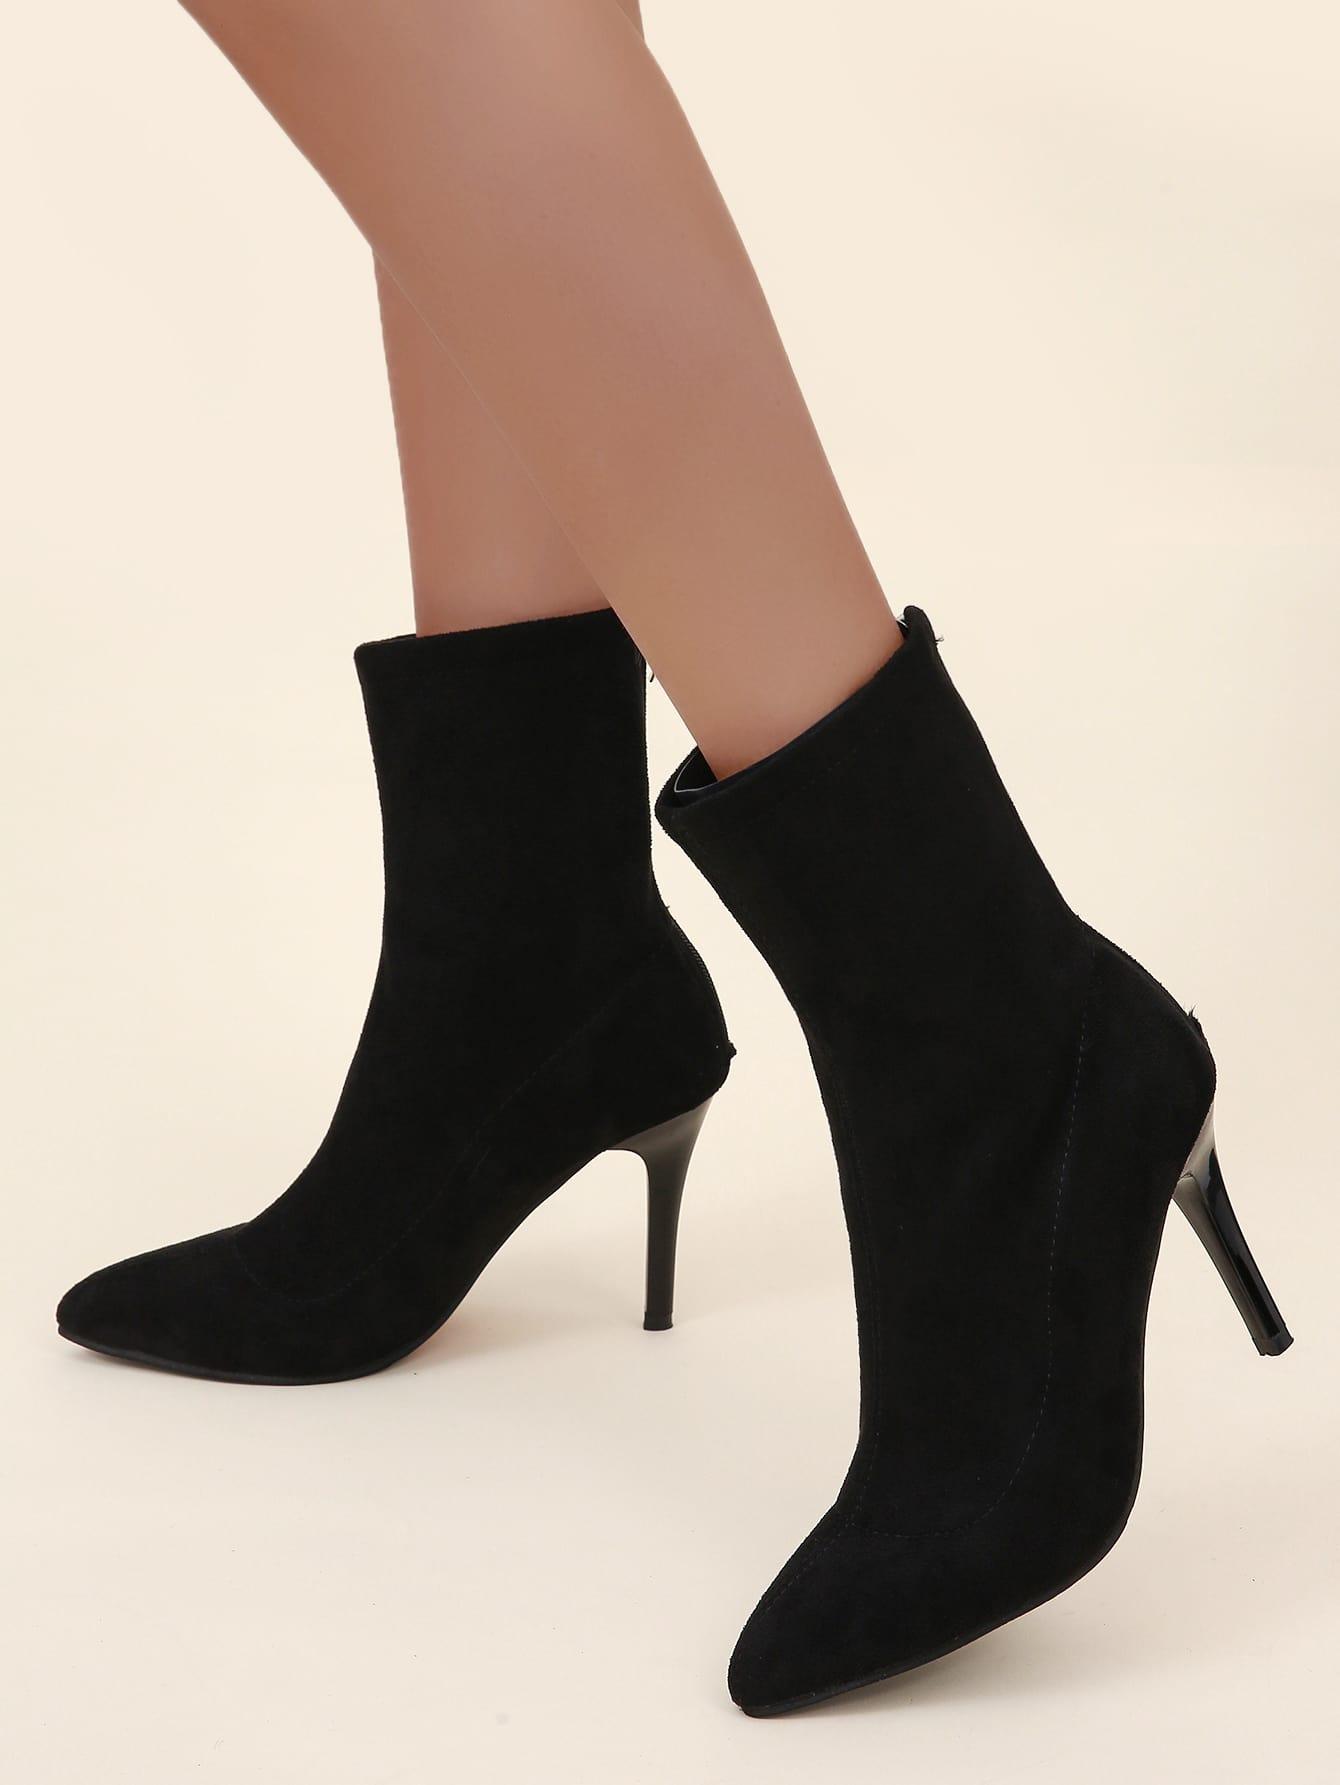 Point Toe Stiletto Classic Boots